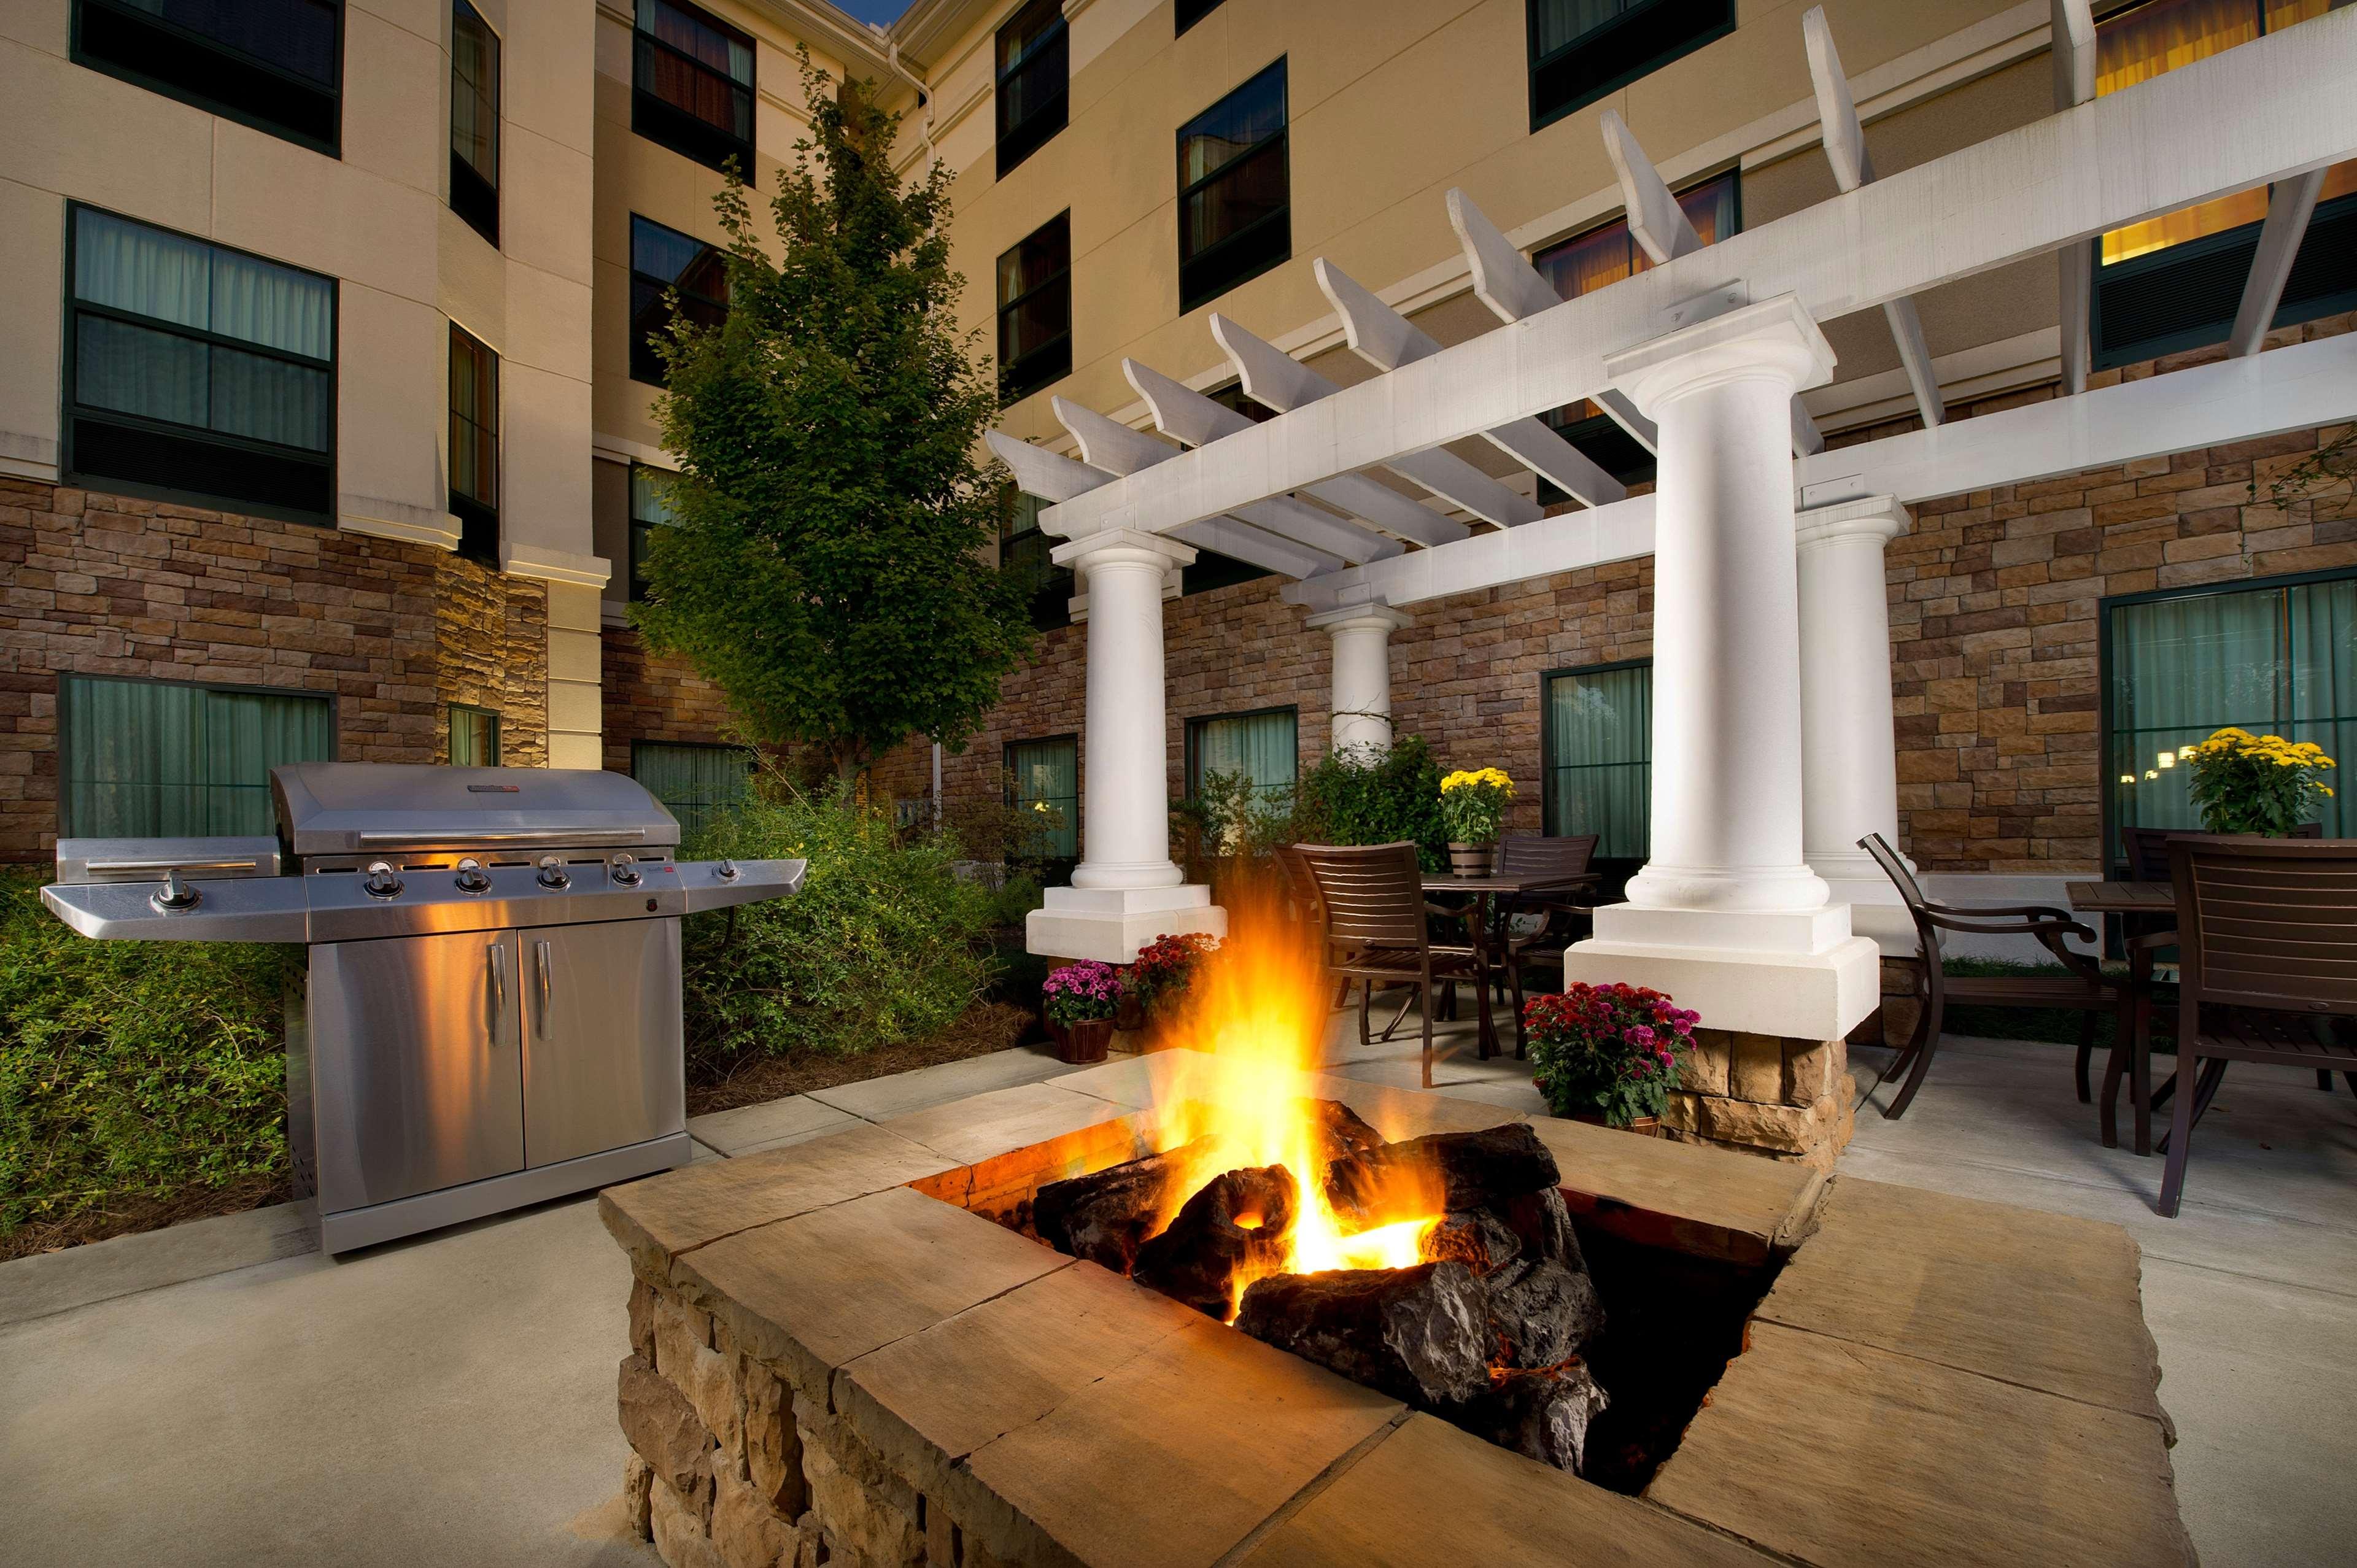 Homewood Suites by Hilton Columbus image 4